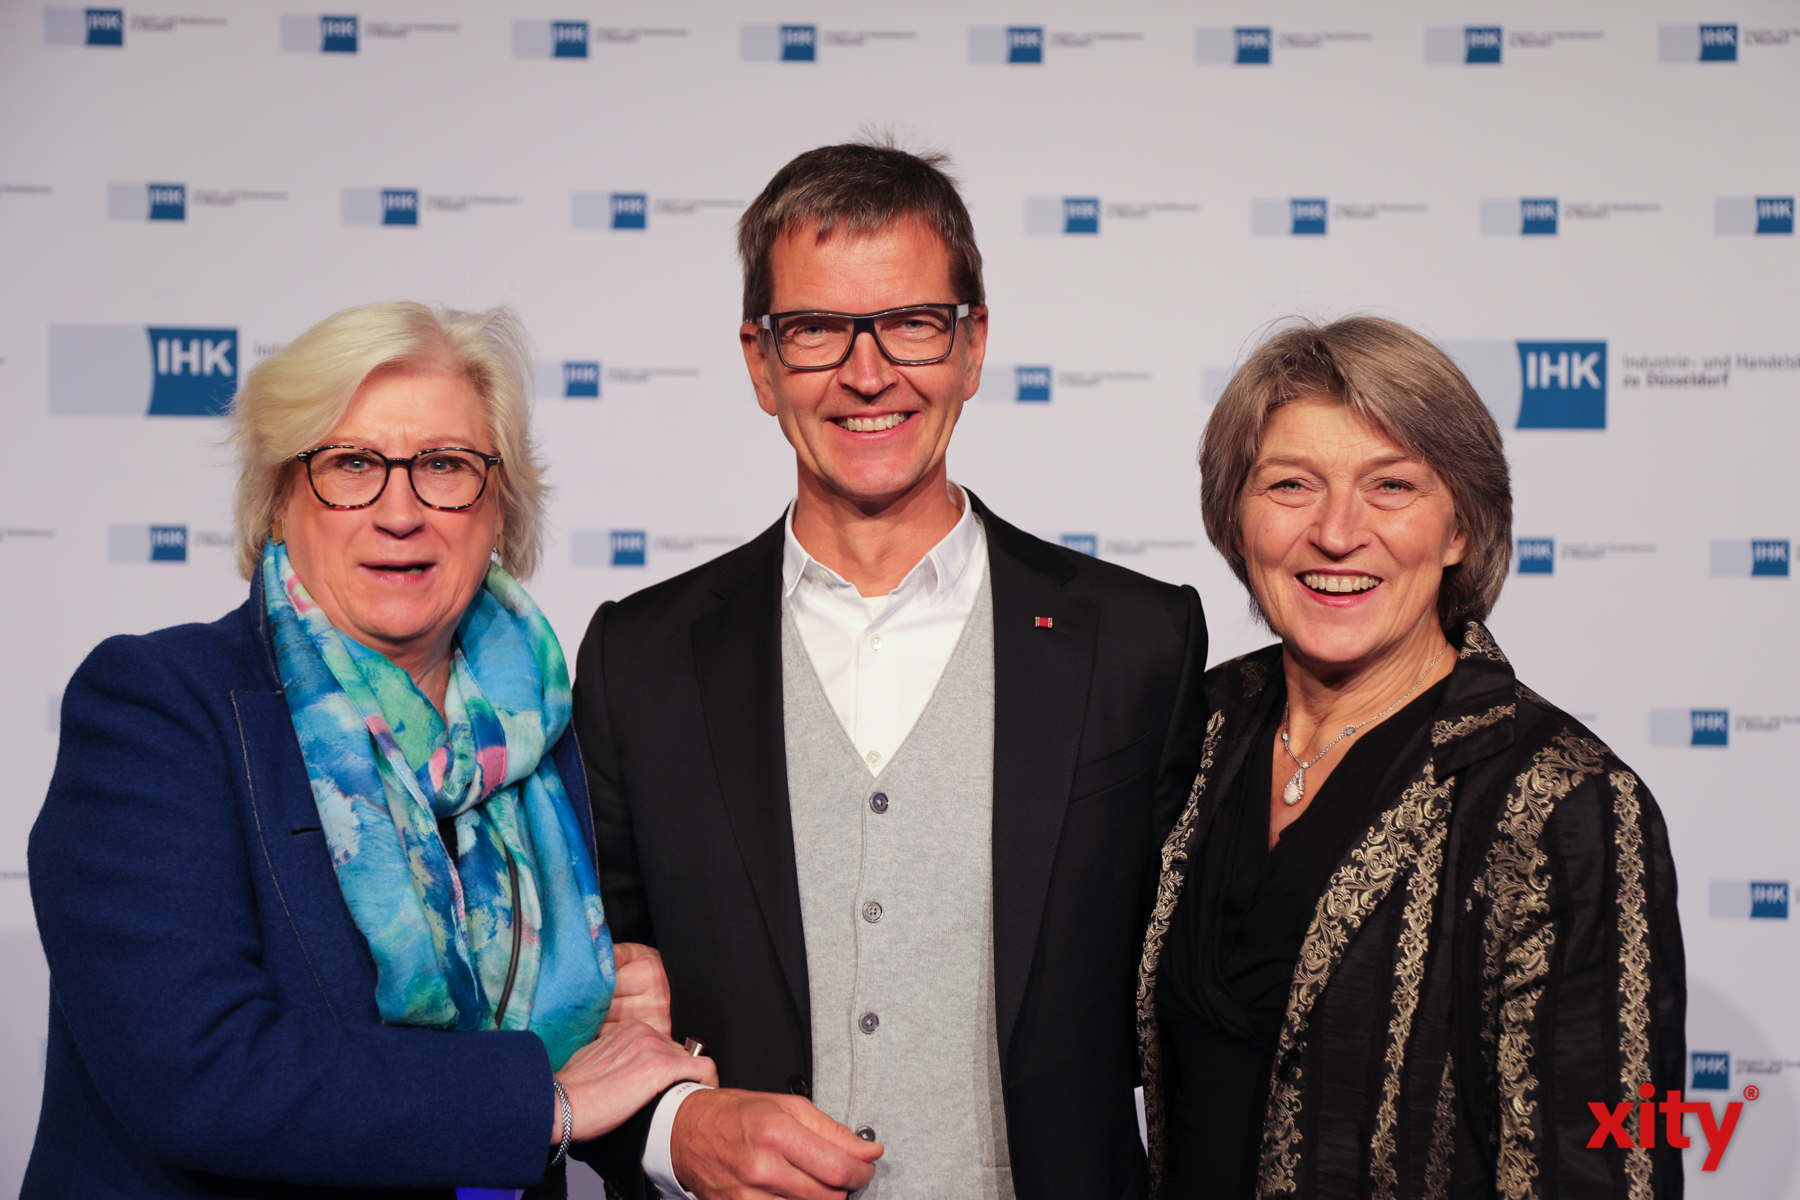 Auch unter den Gästen: Düsseldorfs bekanntester Bäckermeister, Josef Hinkel (Foto: xity)